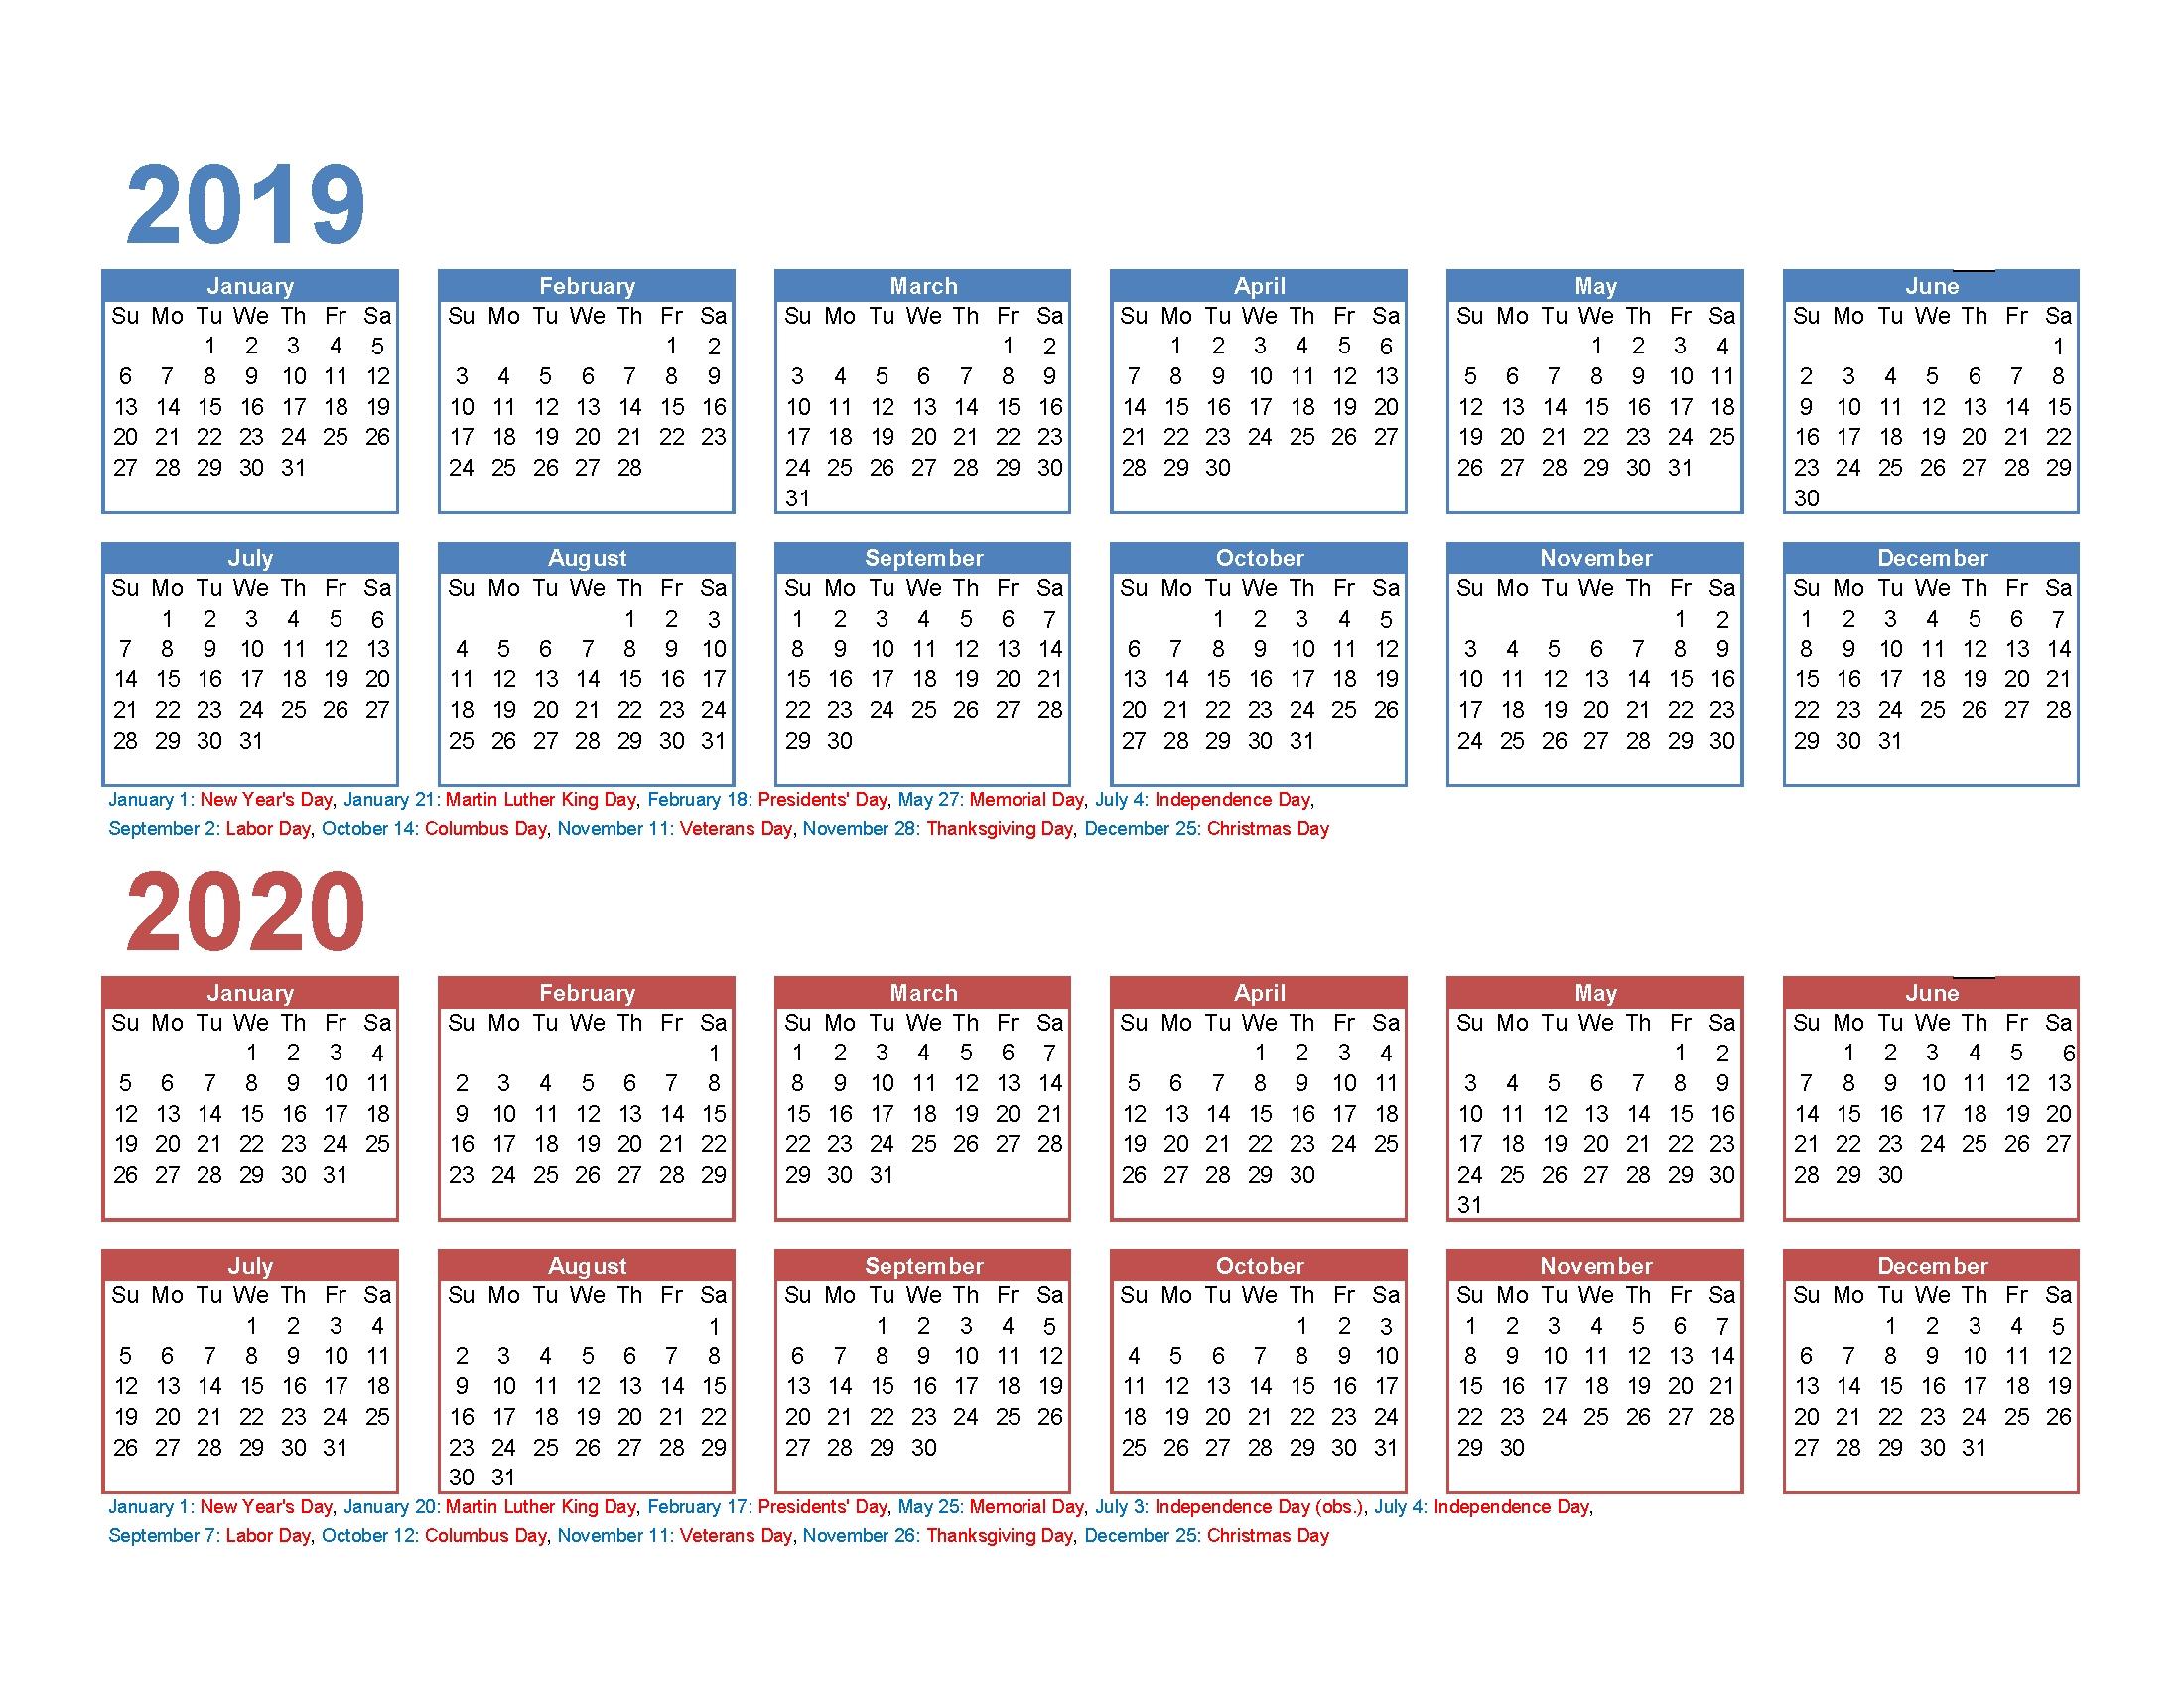 Free 2019 And 2020 Calendar Printable 2 Year Calendar | Free